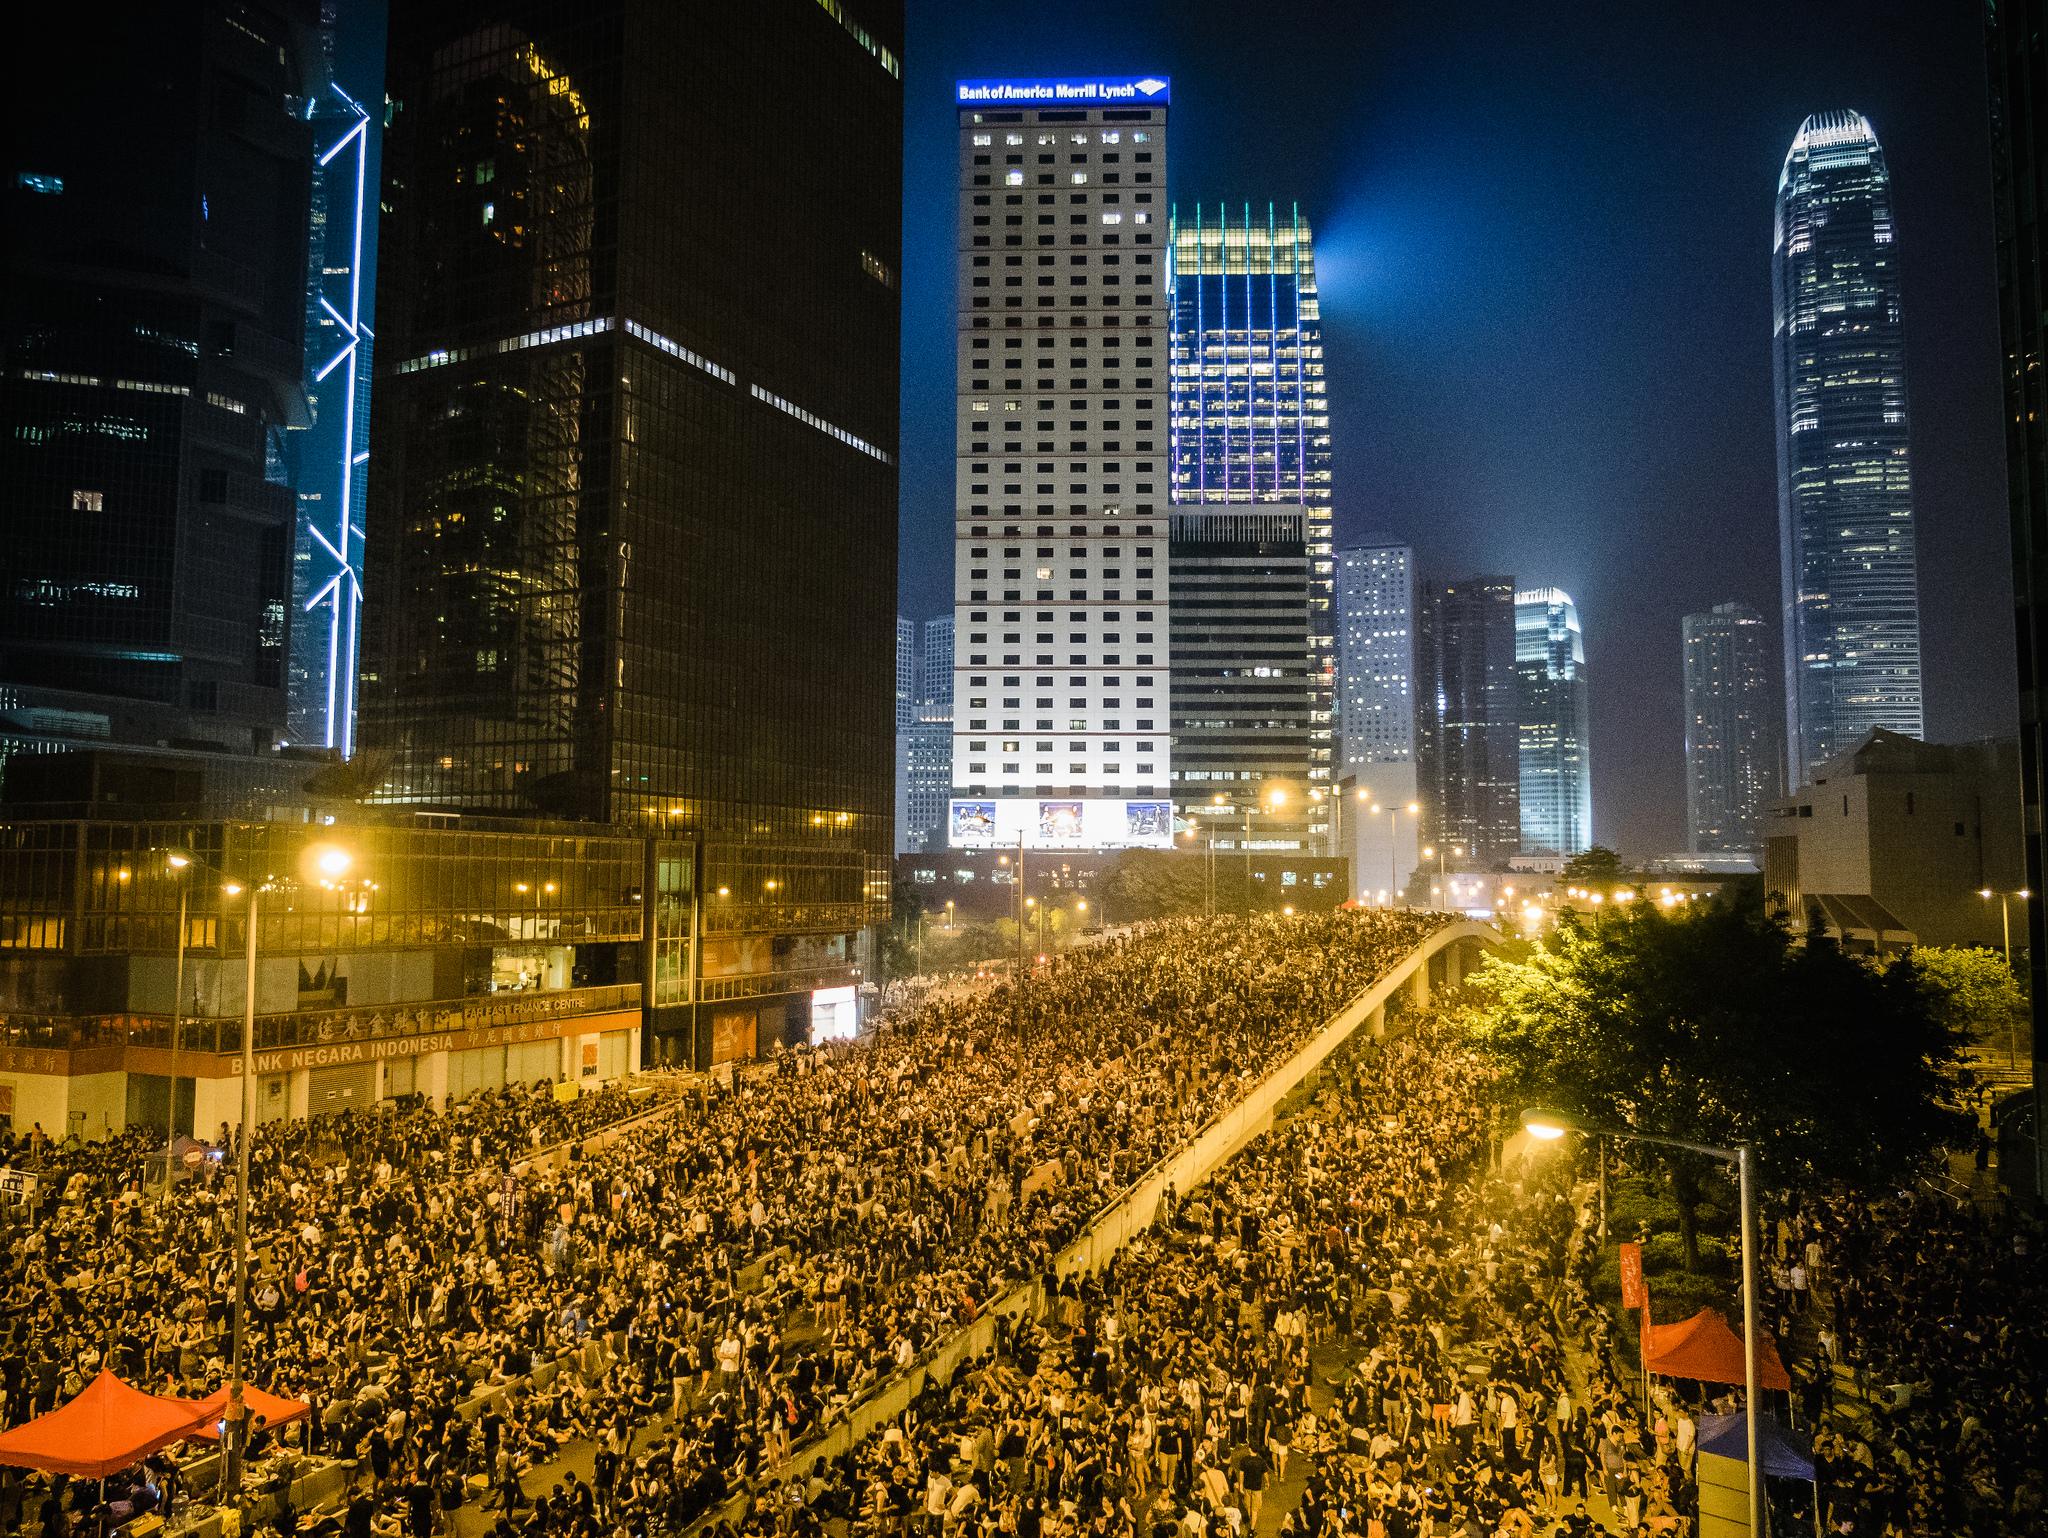 Hong Kong 'umbrella' protest. (Photo: Studio Incendo/Flickr)